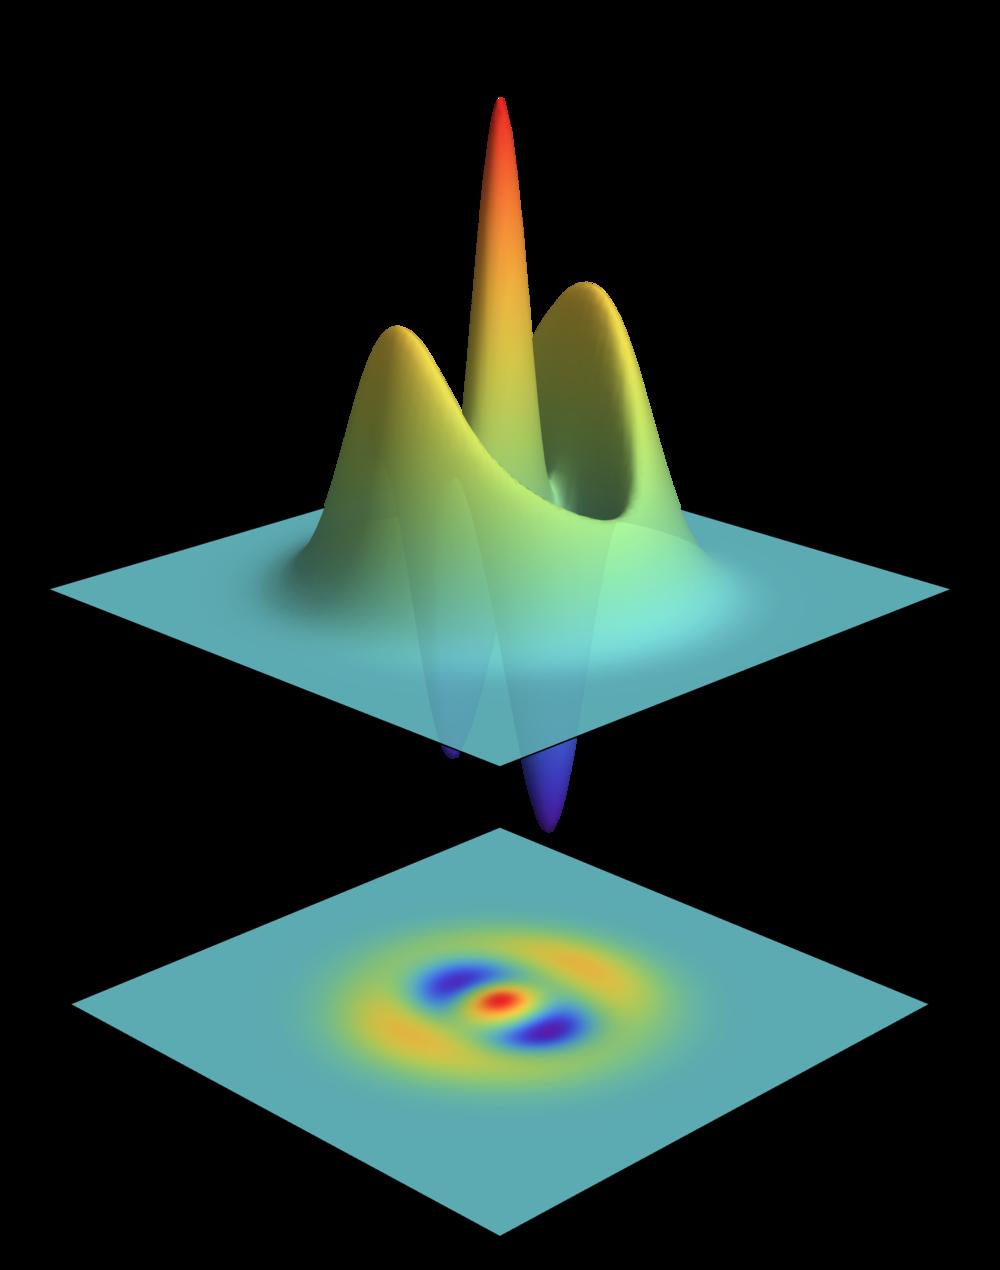 figure5.png